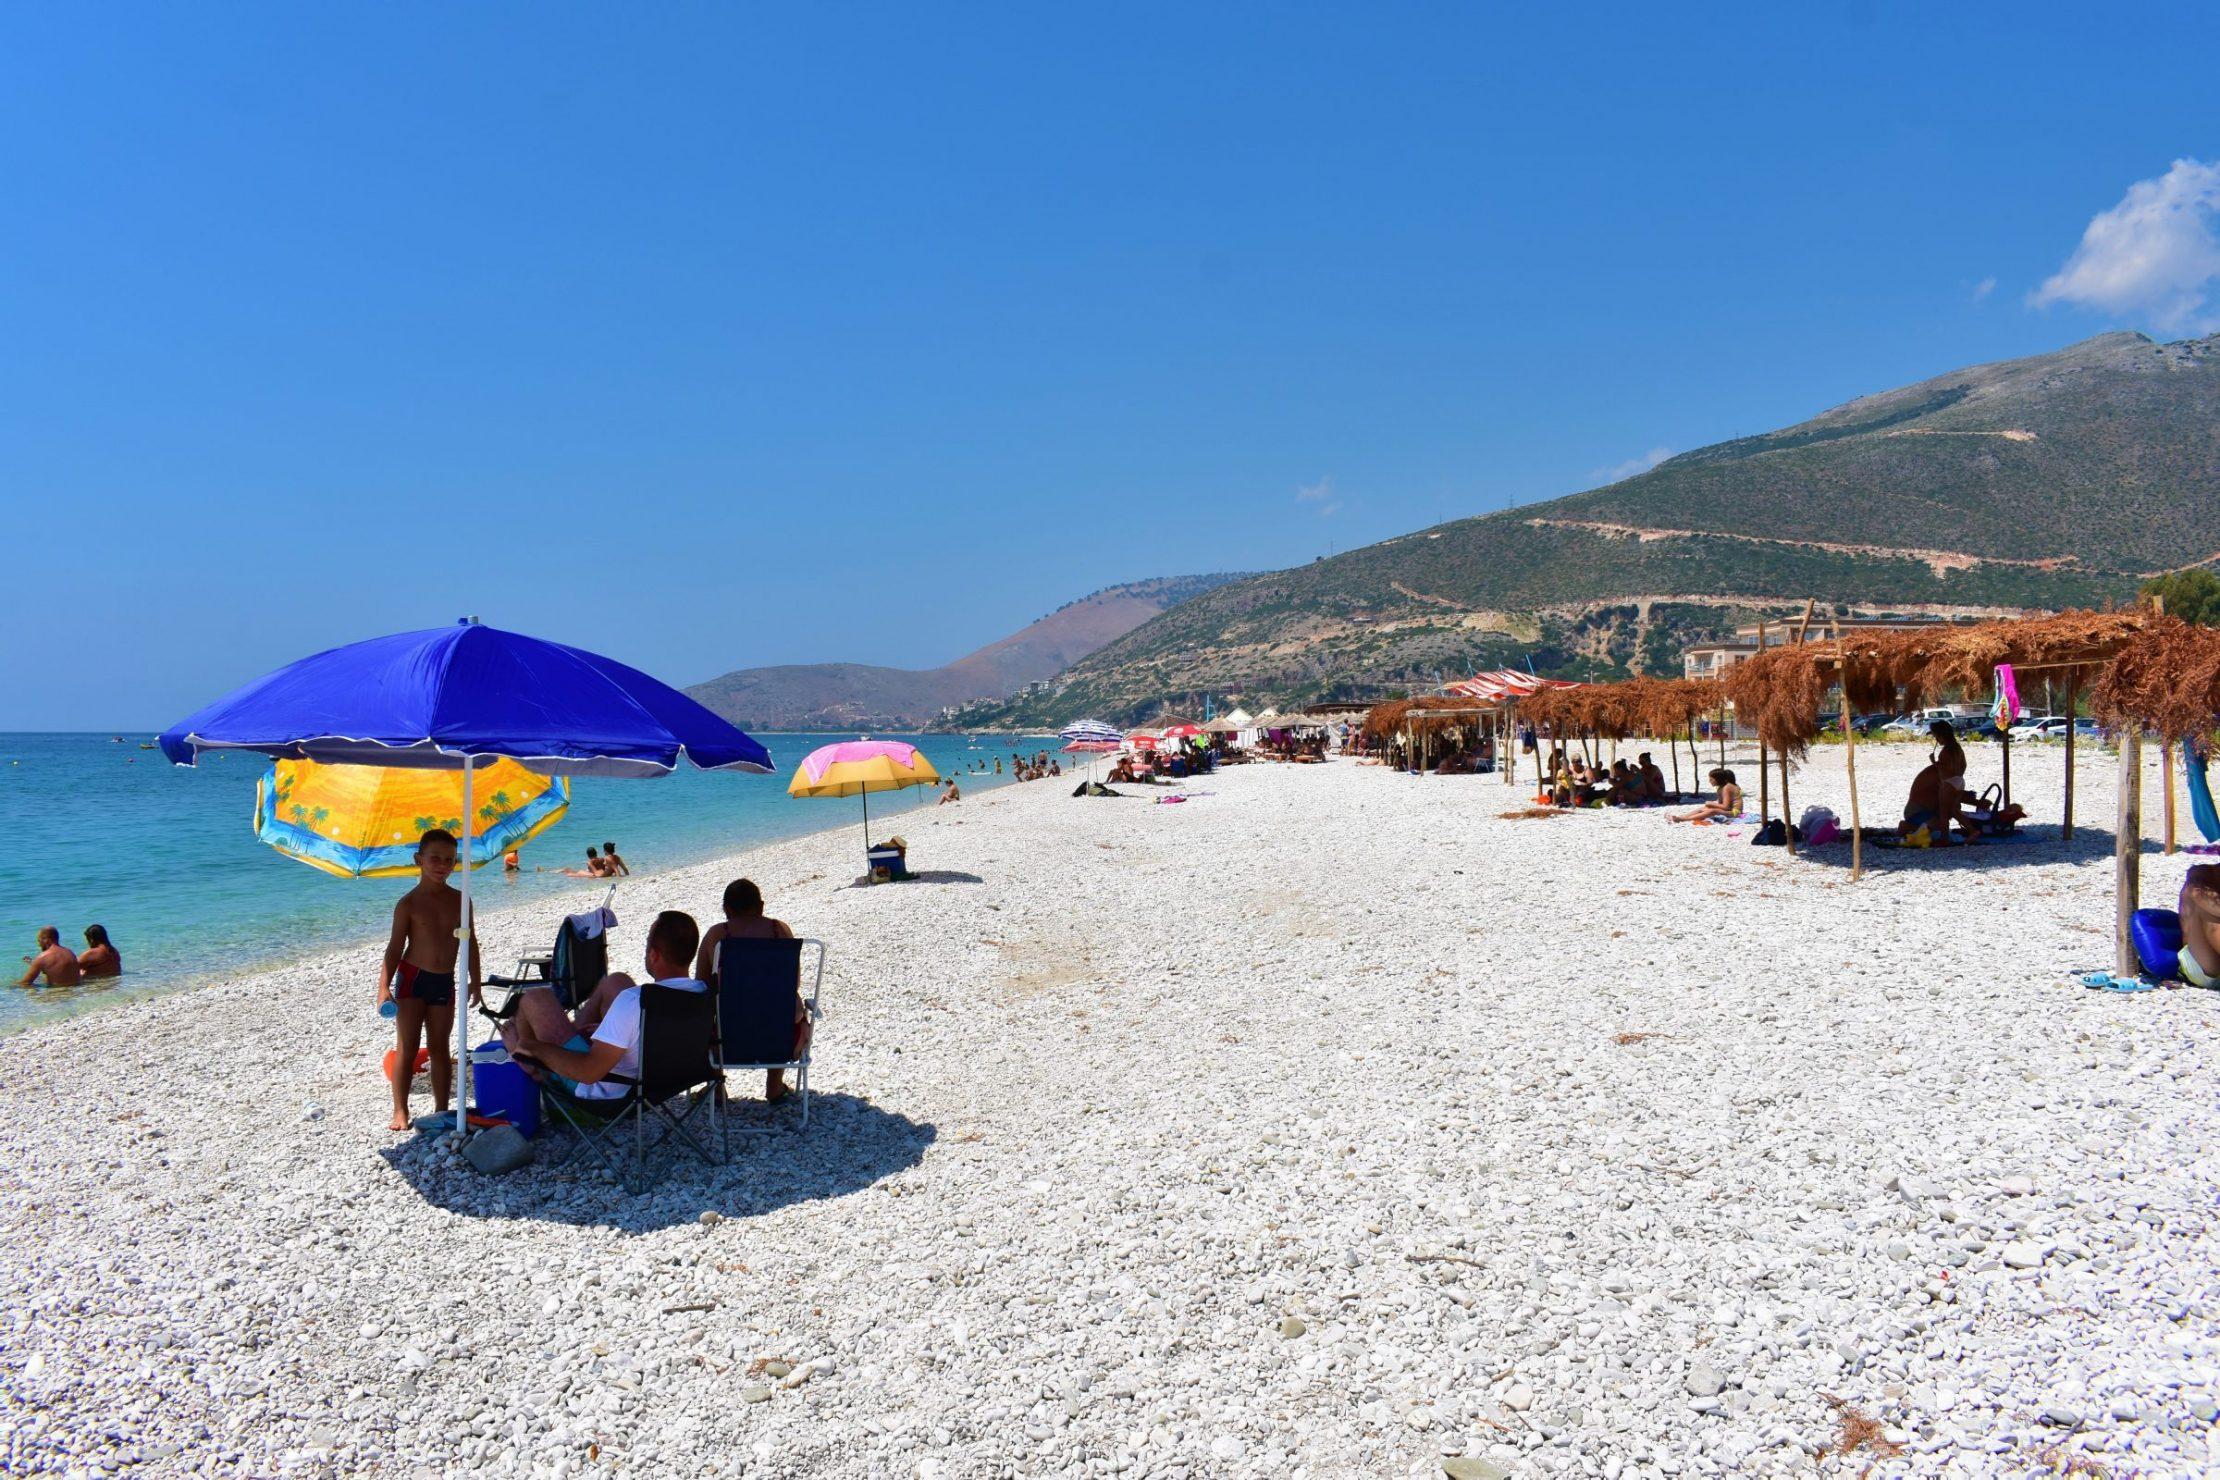 Borshi beach, one of the longest on the Albanian Riviera